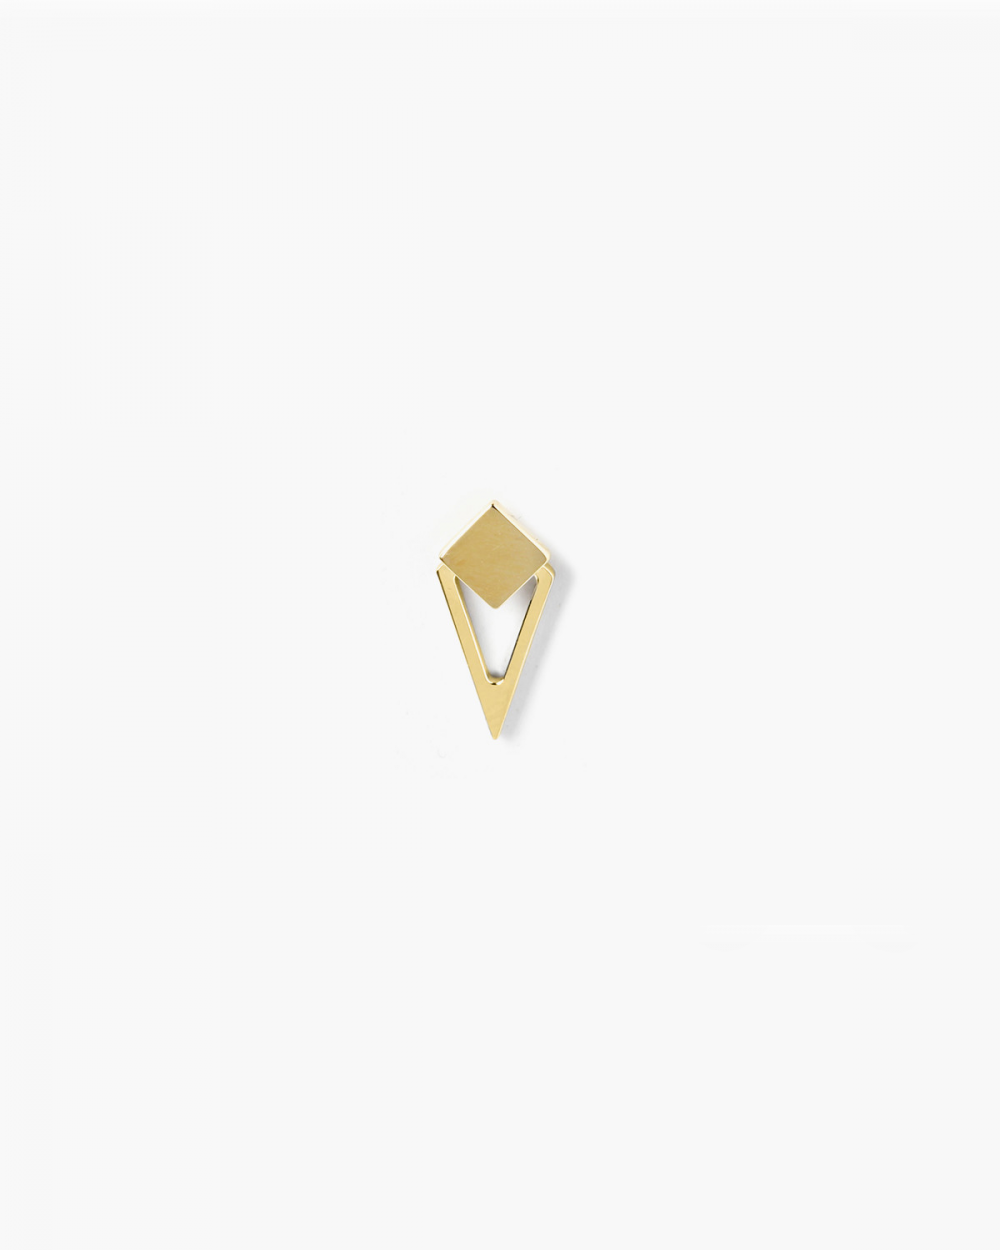 Earrings YELLOW GOLD SQUARE & RHOMBOID SINGLE LOBE EARRING NOVE25